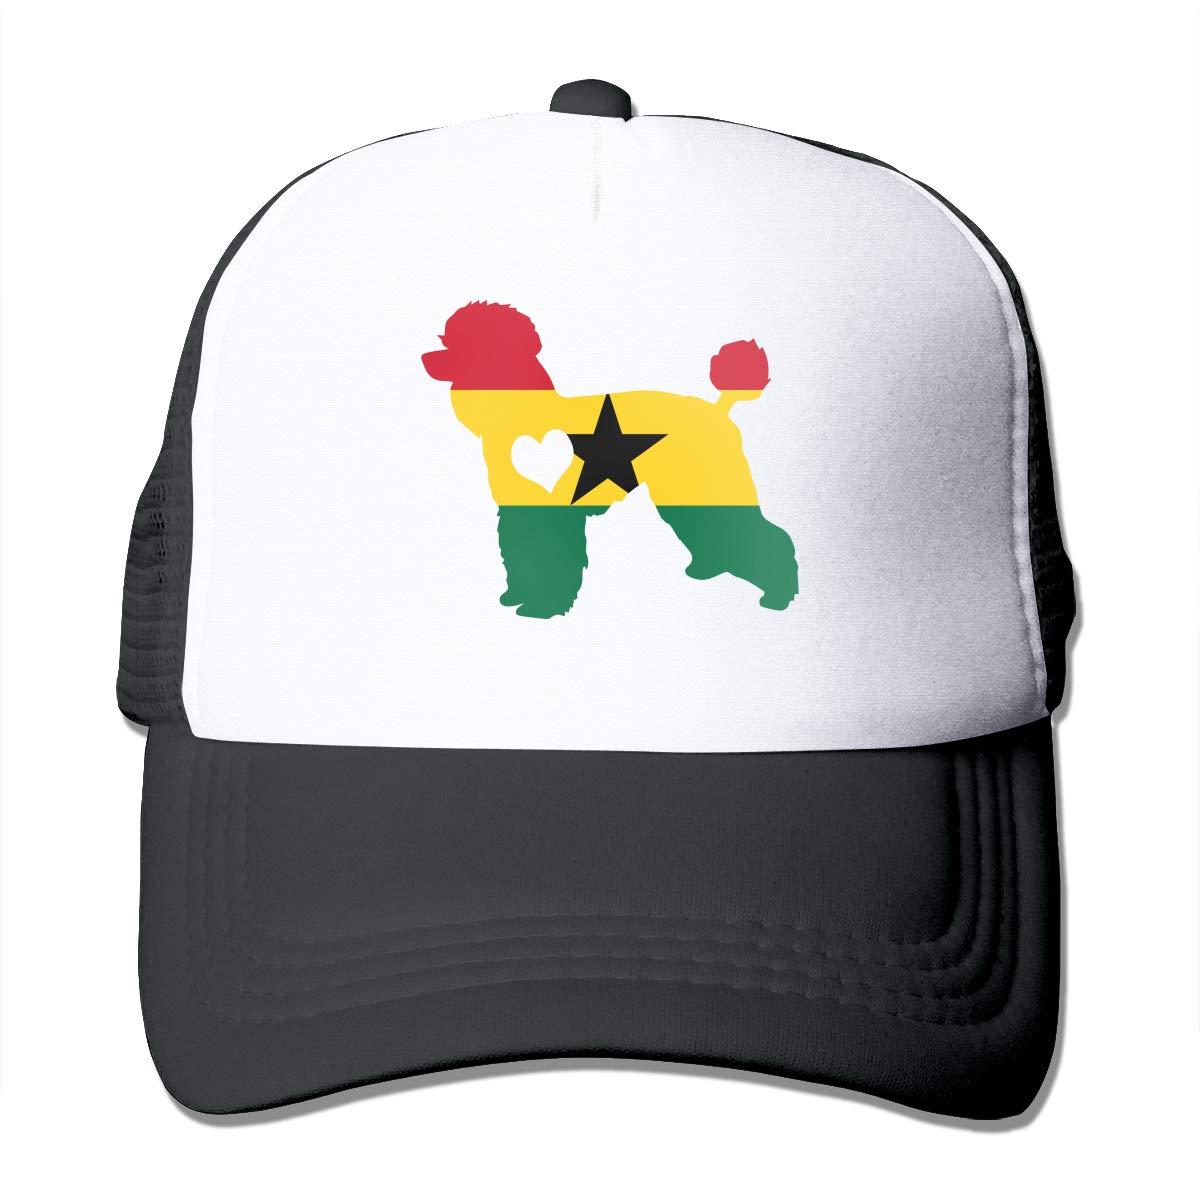 GFDHERW236 Poodle Dog Heart Ghana Flag Trucker Hip-hop Cap Adjustable Outdoors